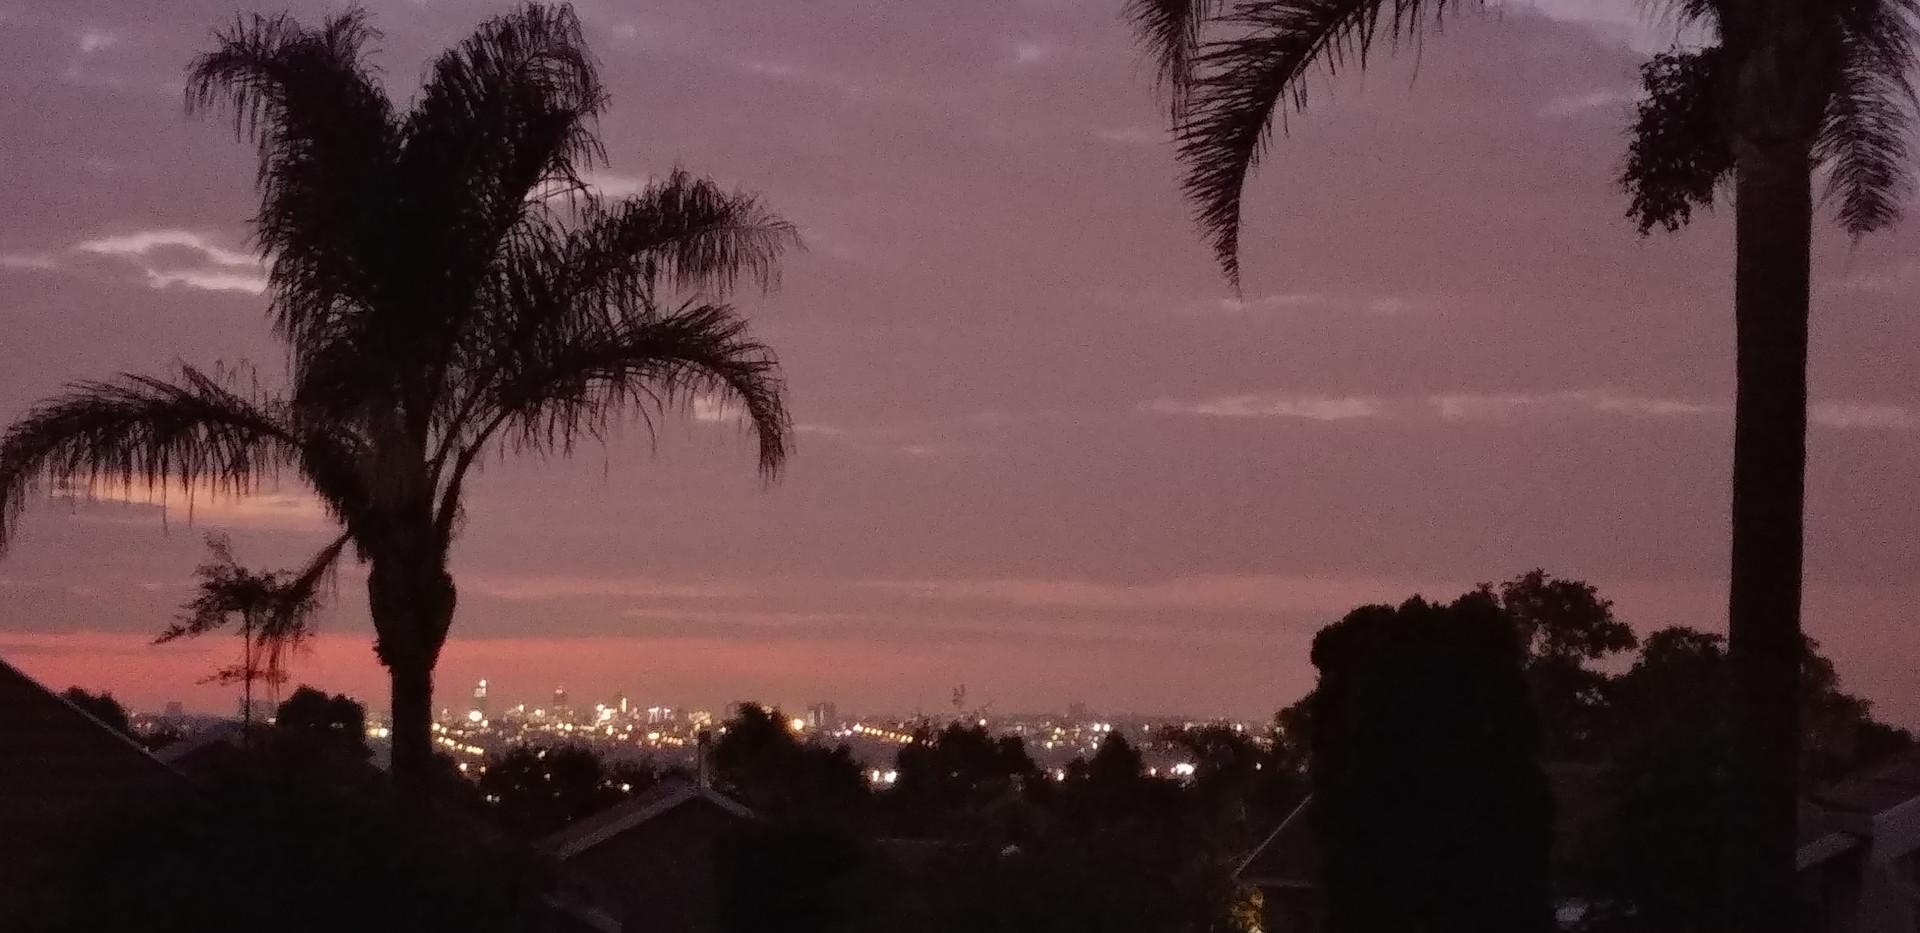 Forrest Lane skyline